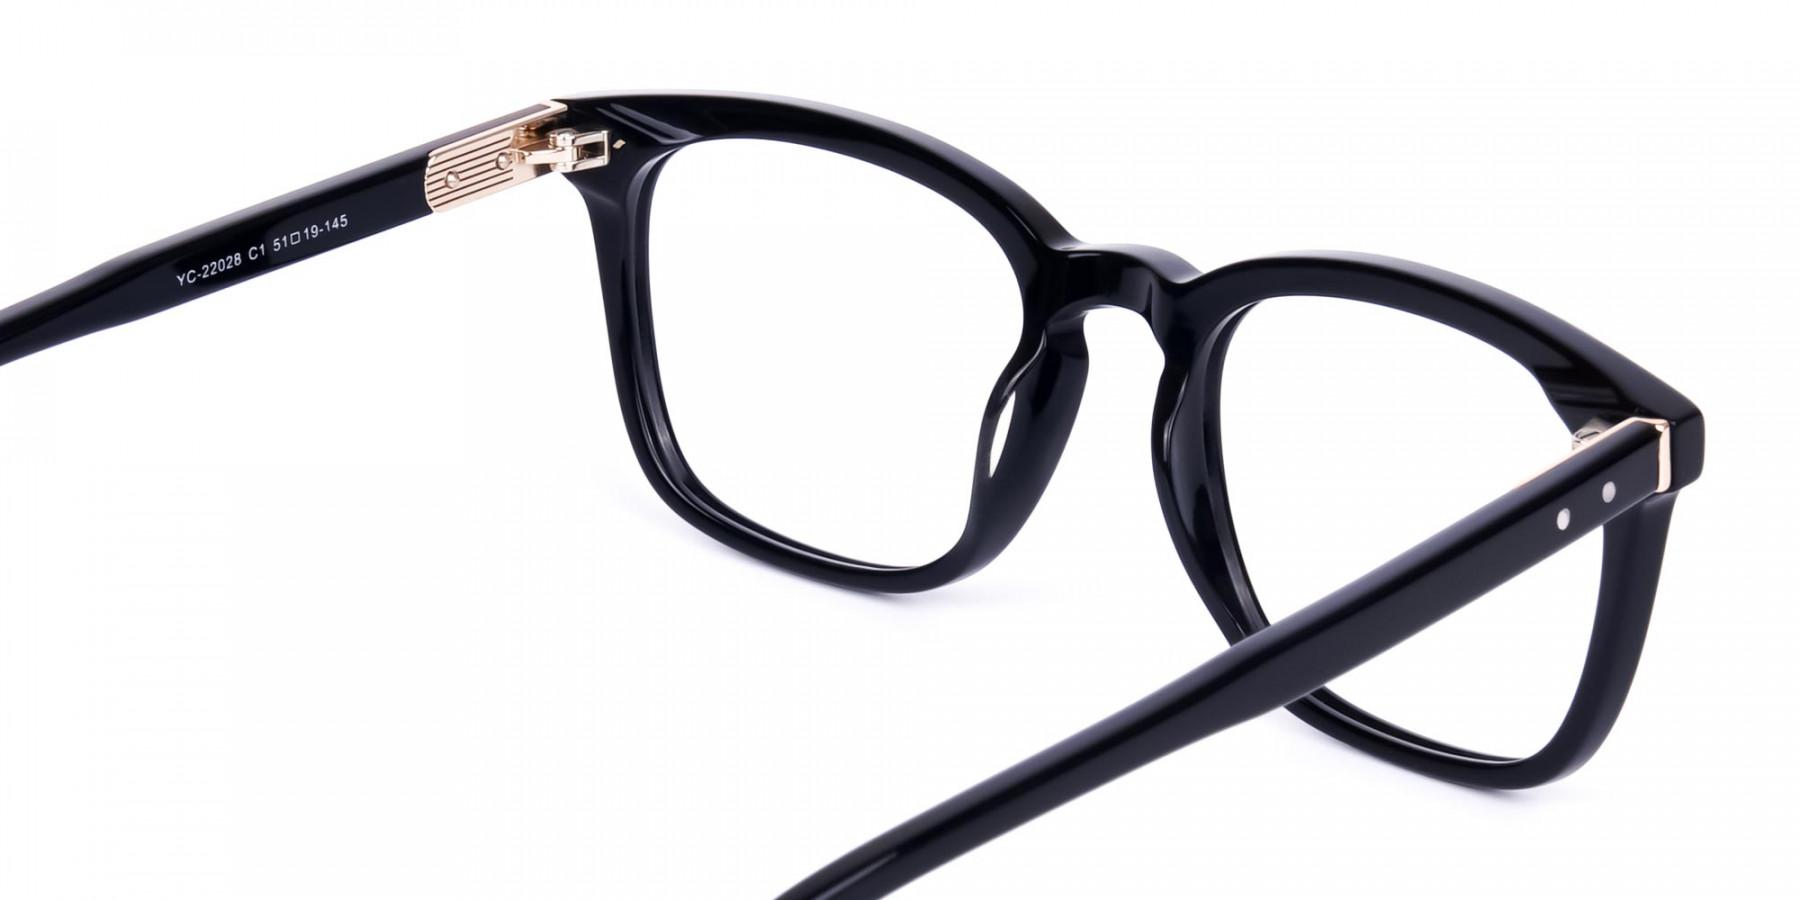 Stylish-Black-Wayfarer-Glasses-1